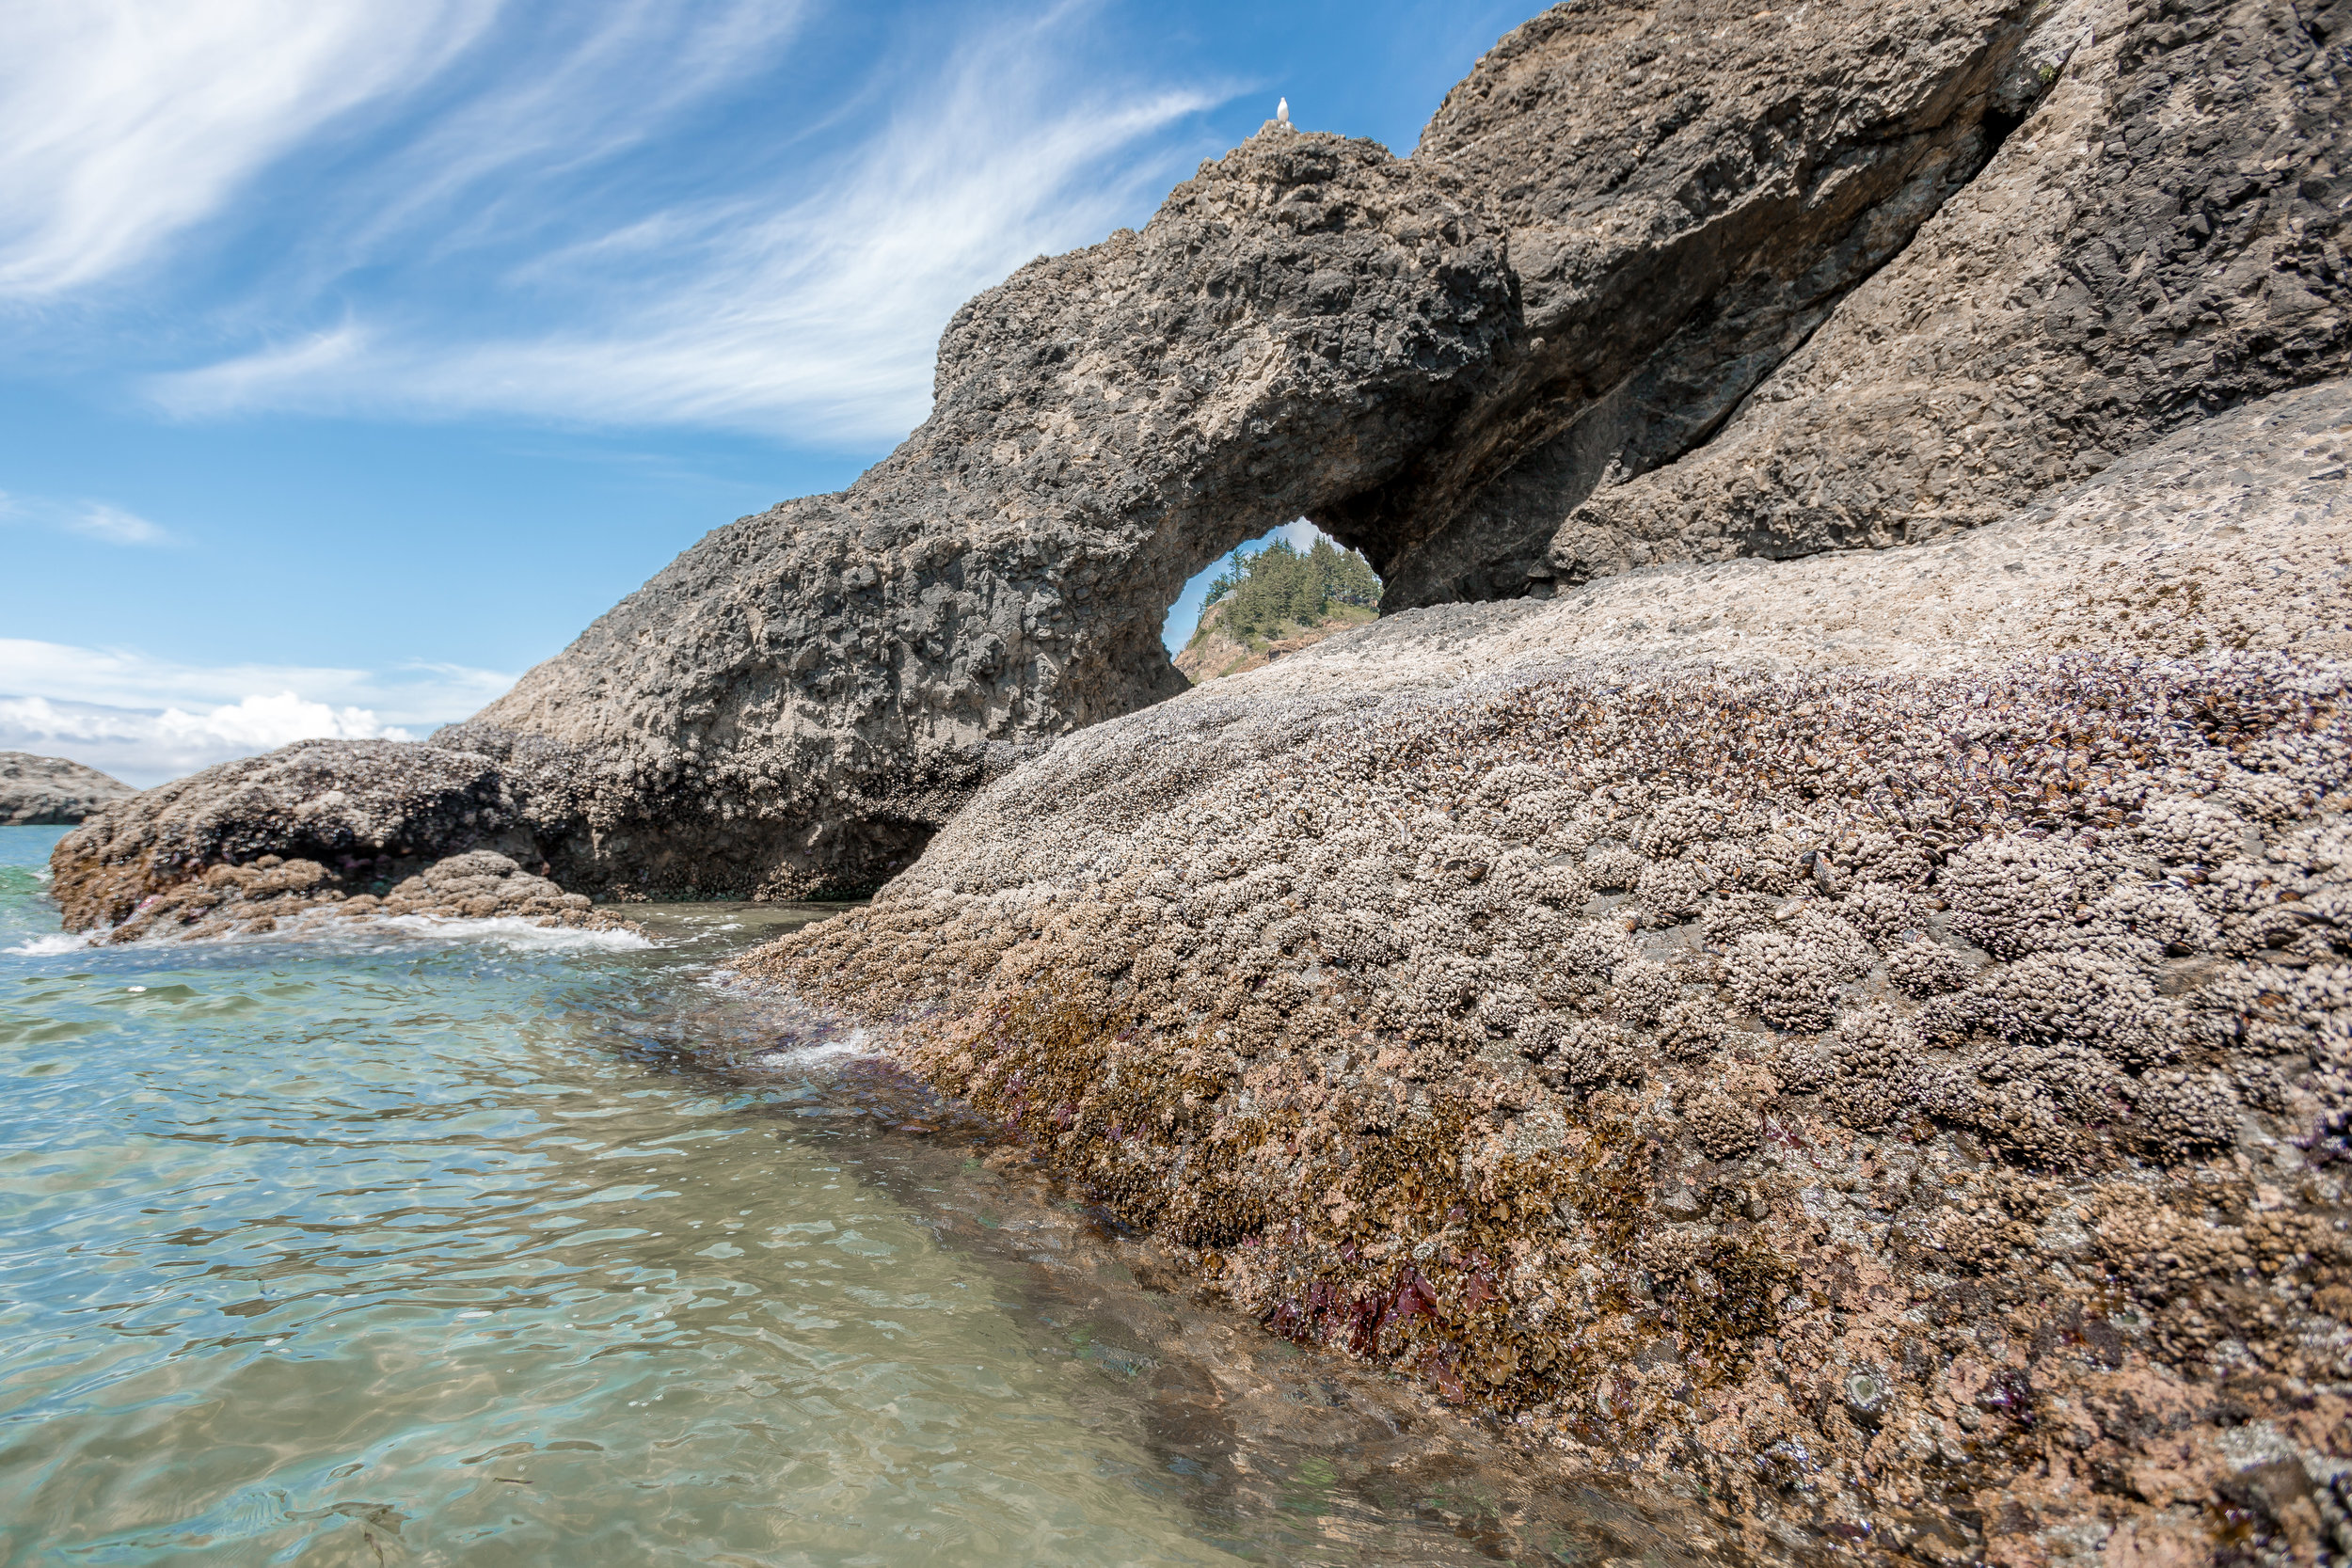 nicole-daacke-photography-oregon-coast-landscapes-elopement-photographer-wedding-photography-adventure-lifestyle-roadtrip-along-oregon-coast-cape-kiwanda-oceanside-beach-cannon-beach-oregon-pnw-15.jpg